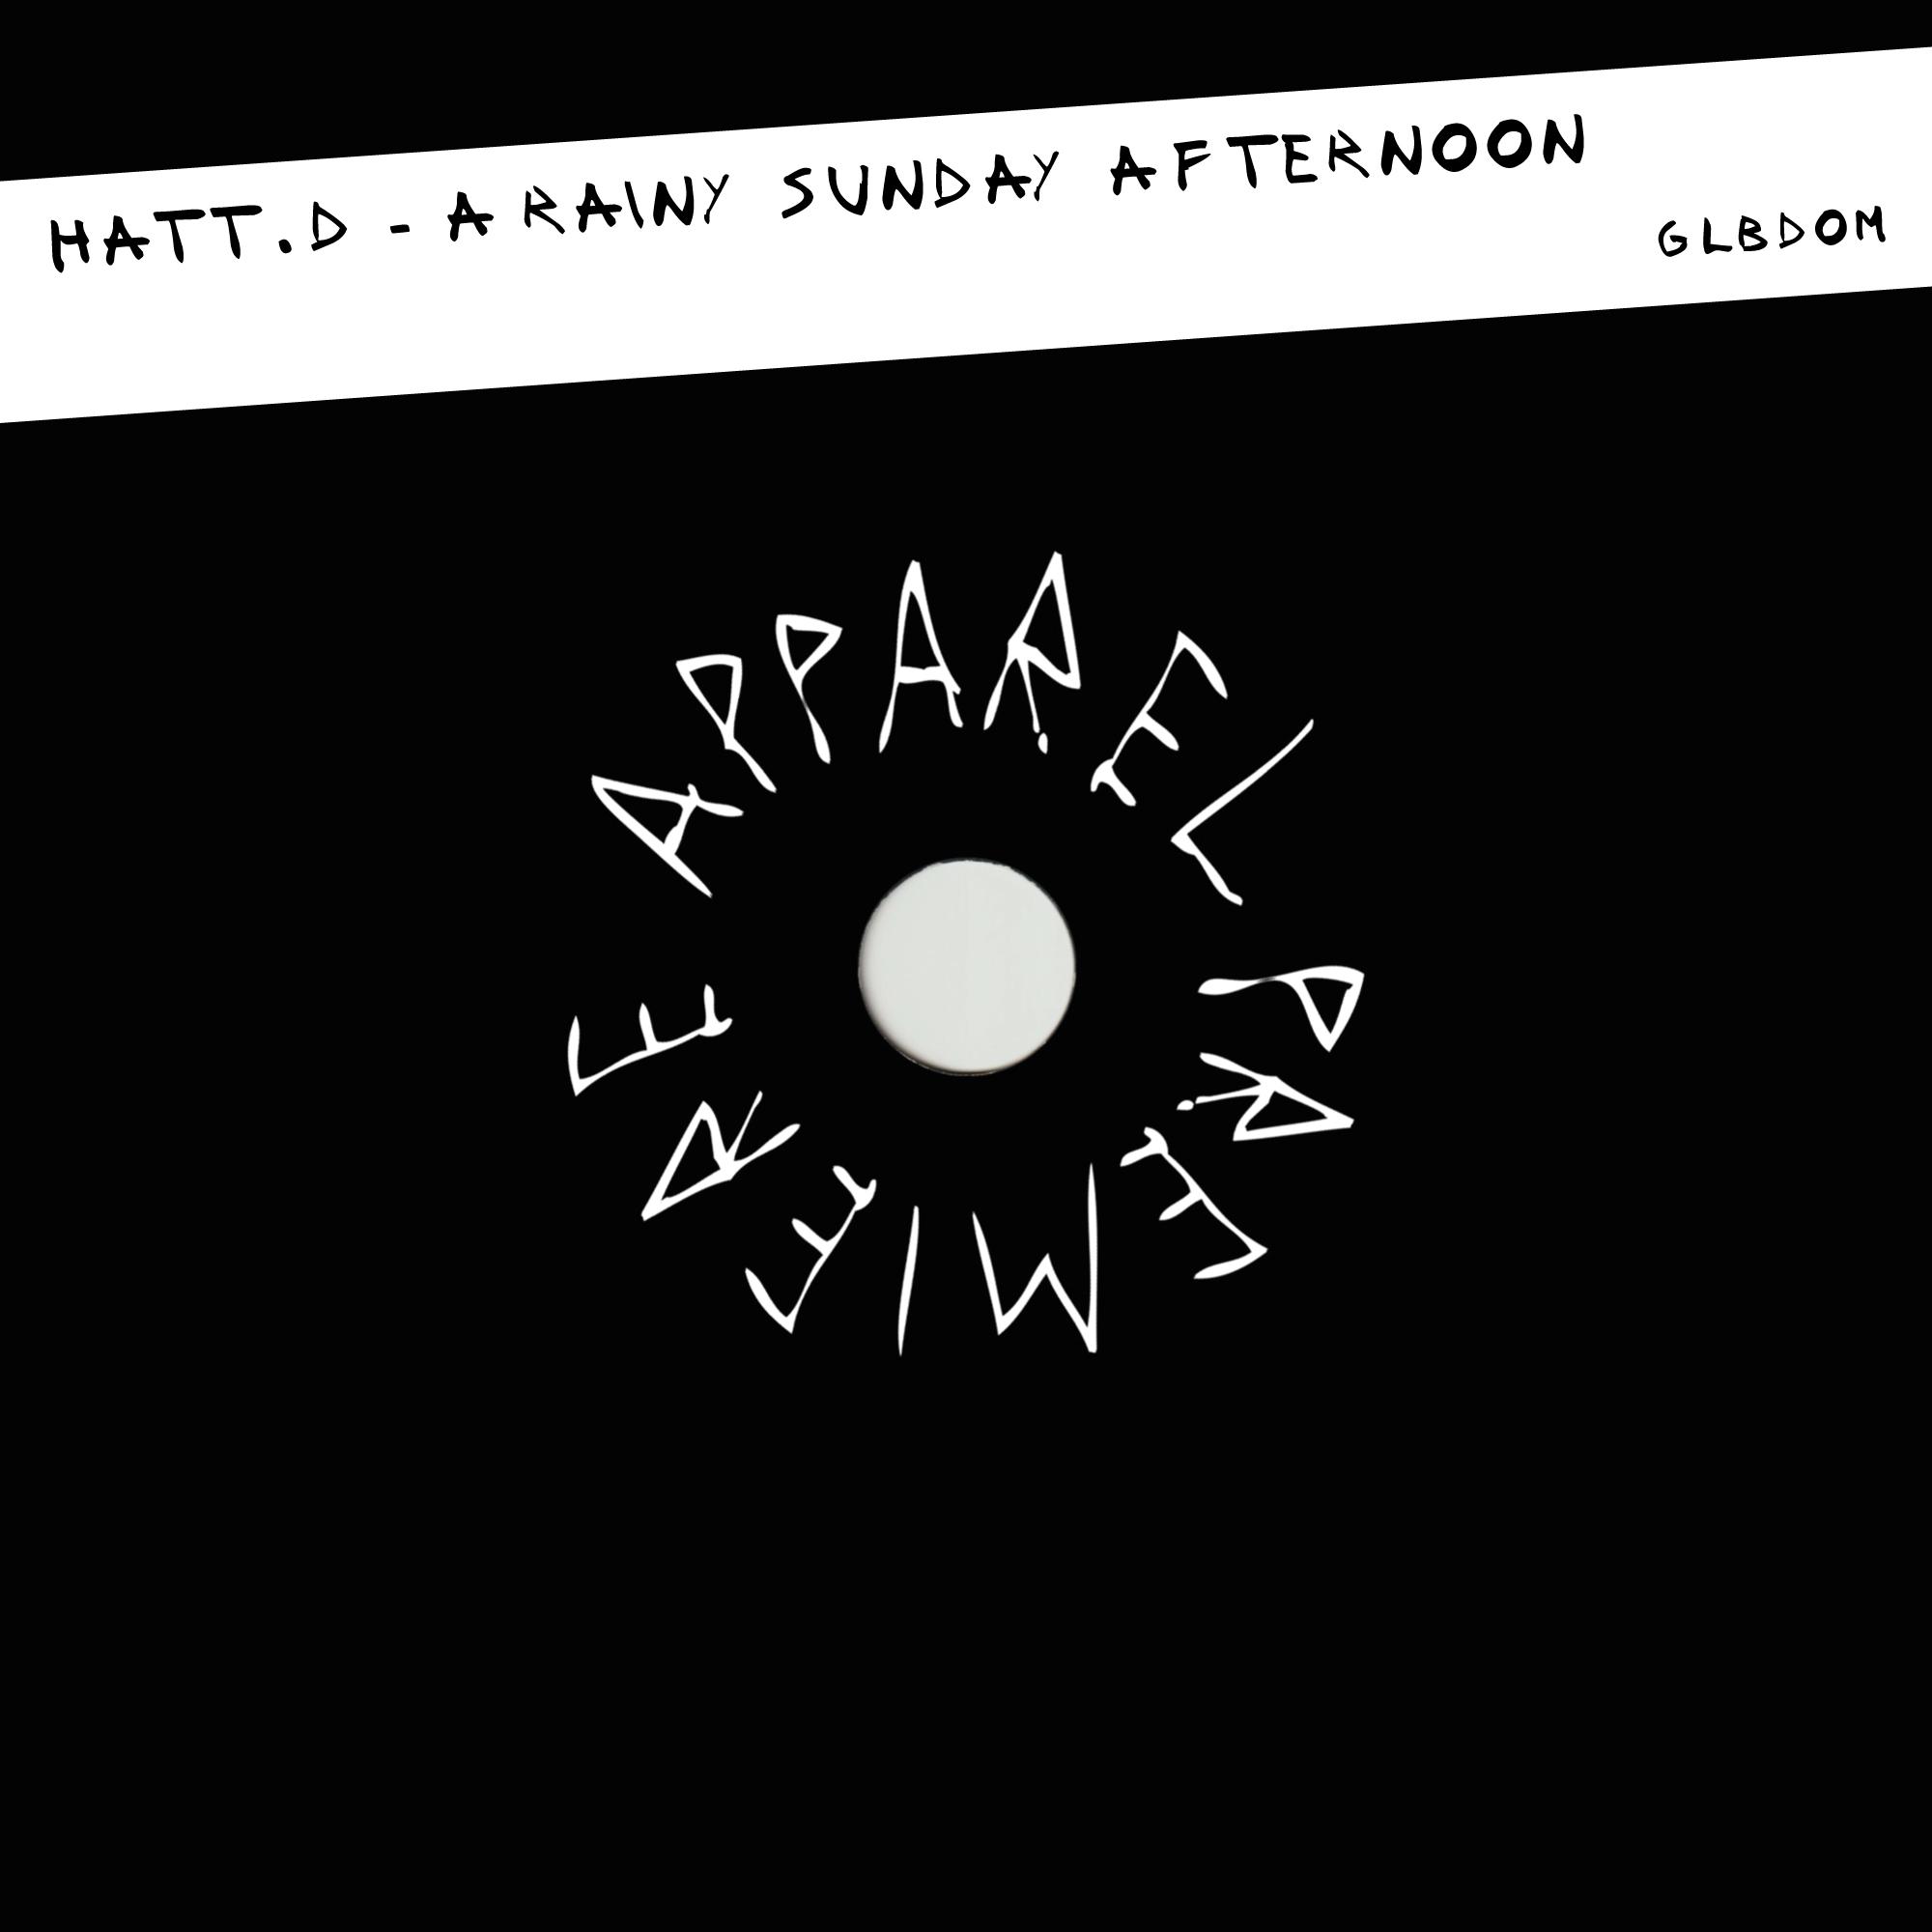 APPAREL PREMIERE: HATT.D – A Rainy Sunday Afternoon [GLBDOM]